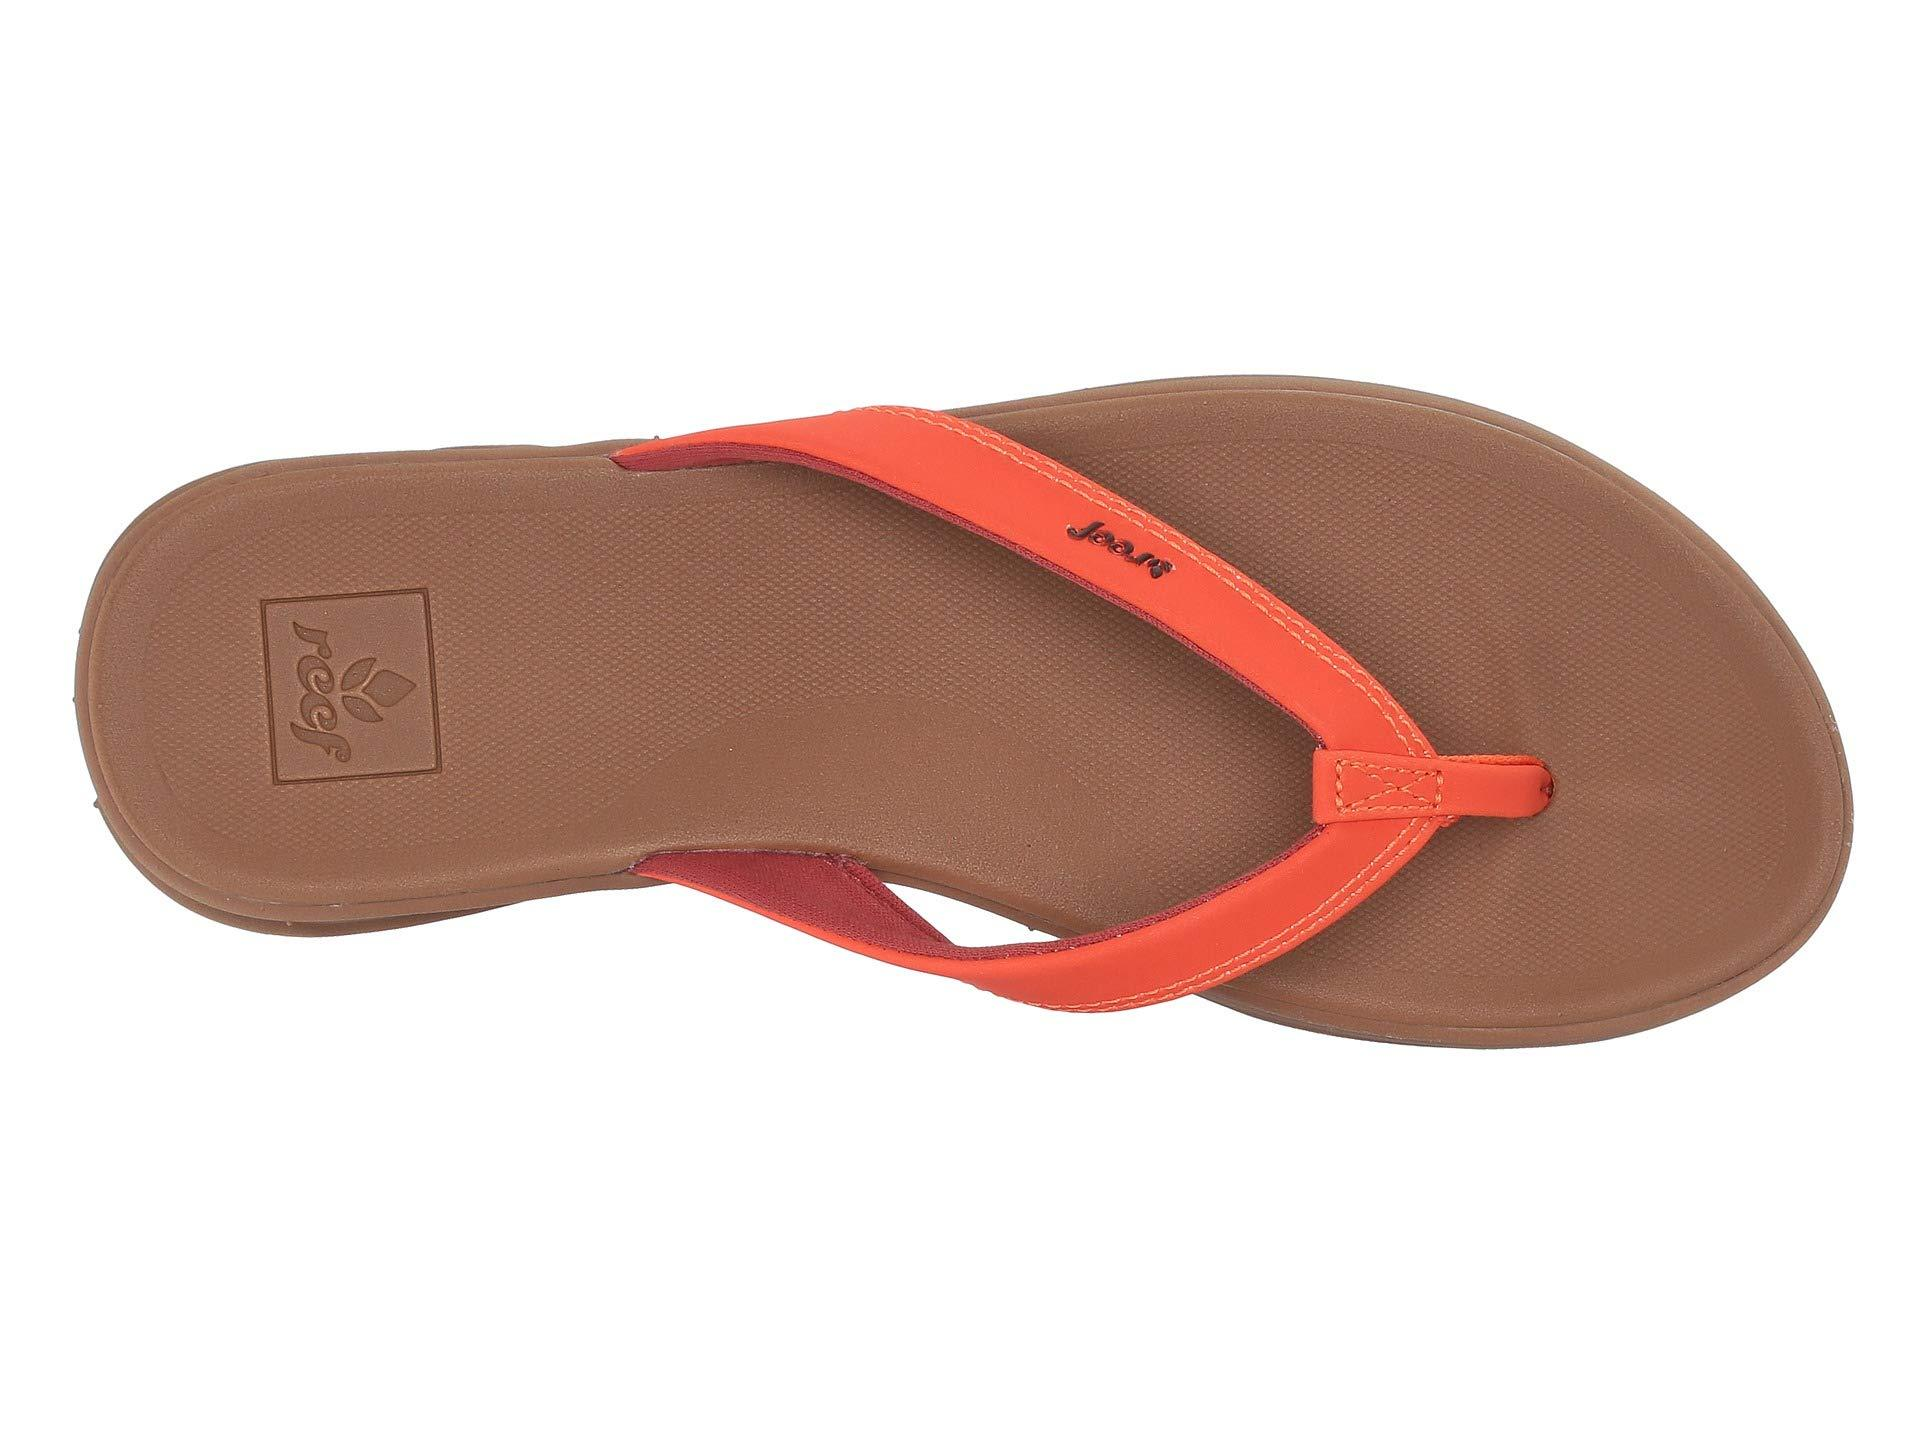 f740e119c912 Reef - Multicolor Rover Catch (black) Women s Sandals - Lyst. View  fullscreen